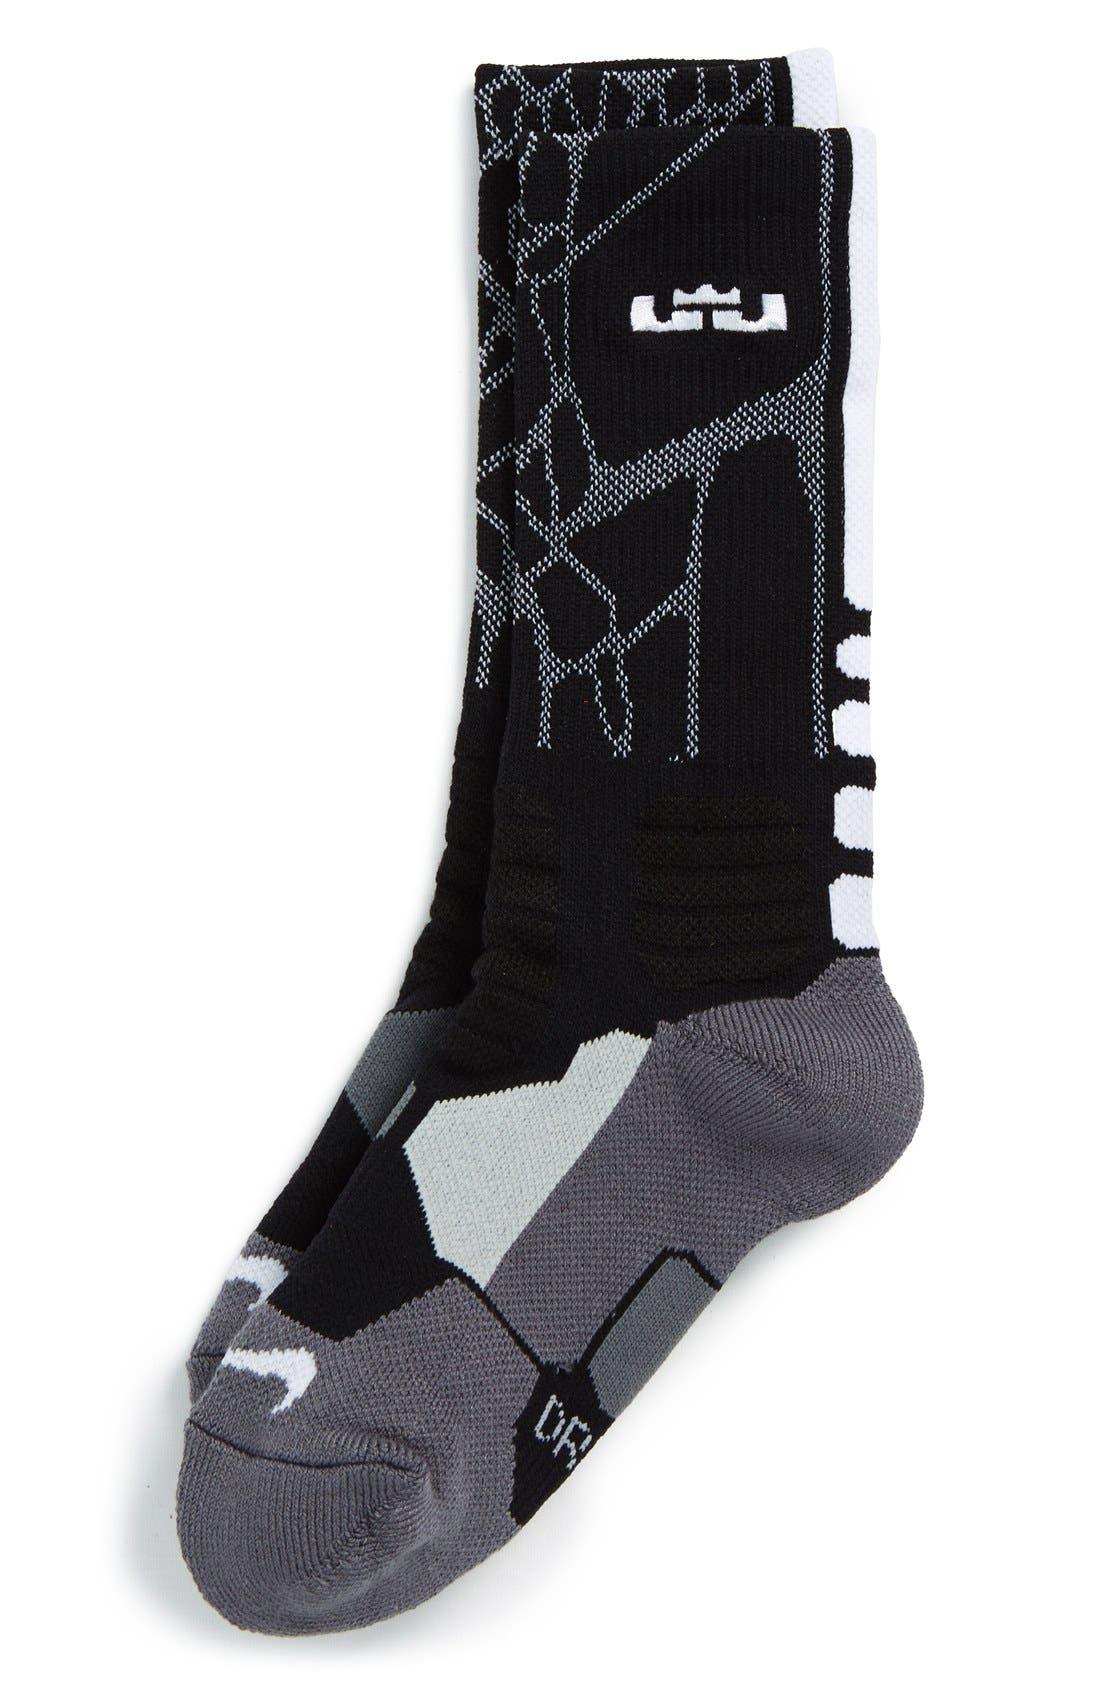 'LeBron - Hyper Elite' Cushioned Basketball Crew Socks,                             Main thumbnail 1, color,                             001